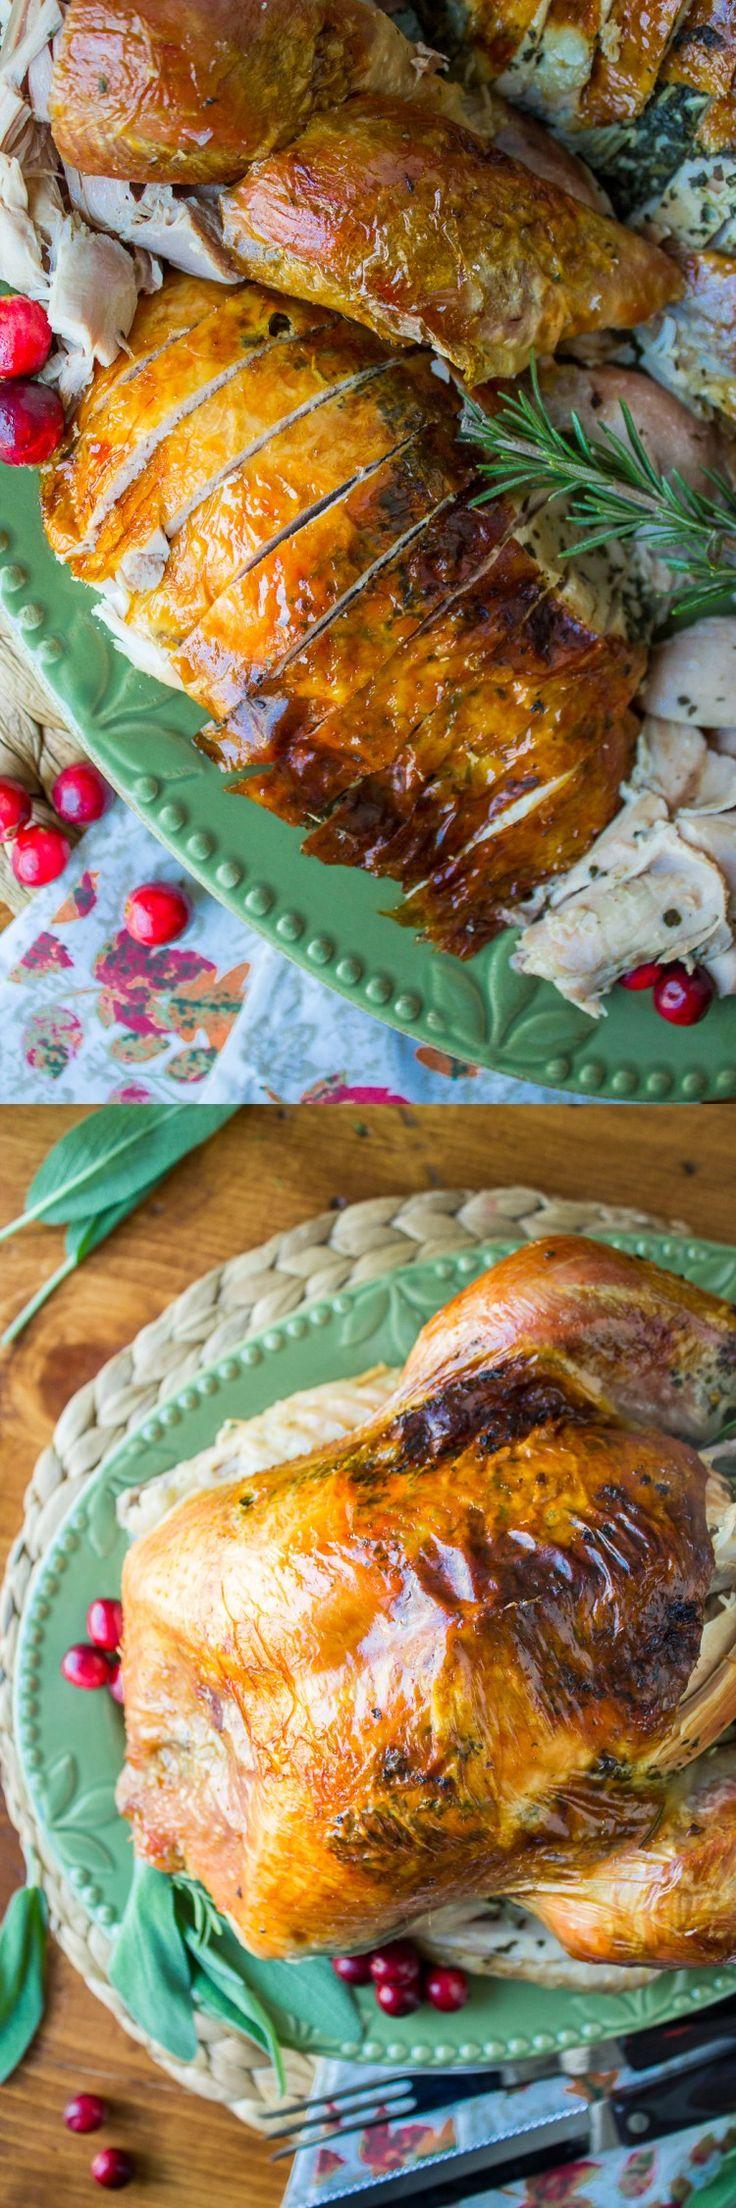 ... Roasted Turkey, Turkey Sage, Butter Roasted, Sage Butter, Beginner